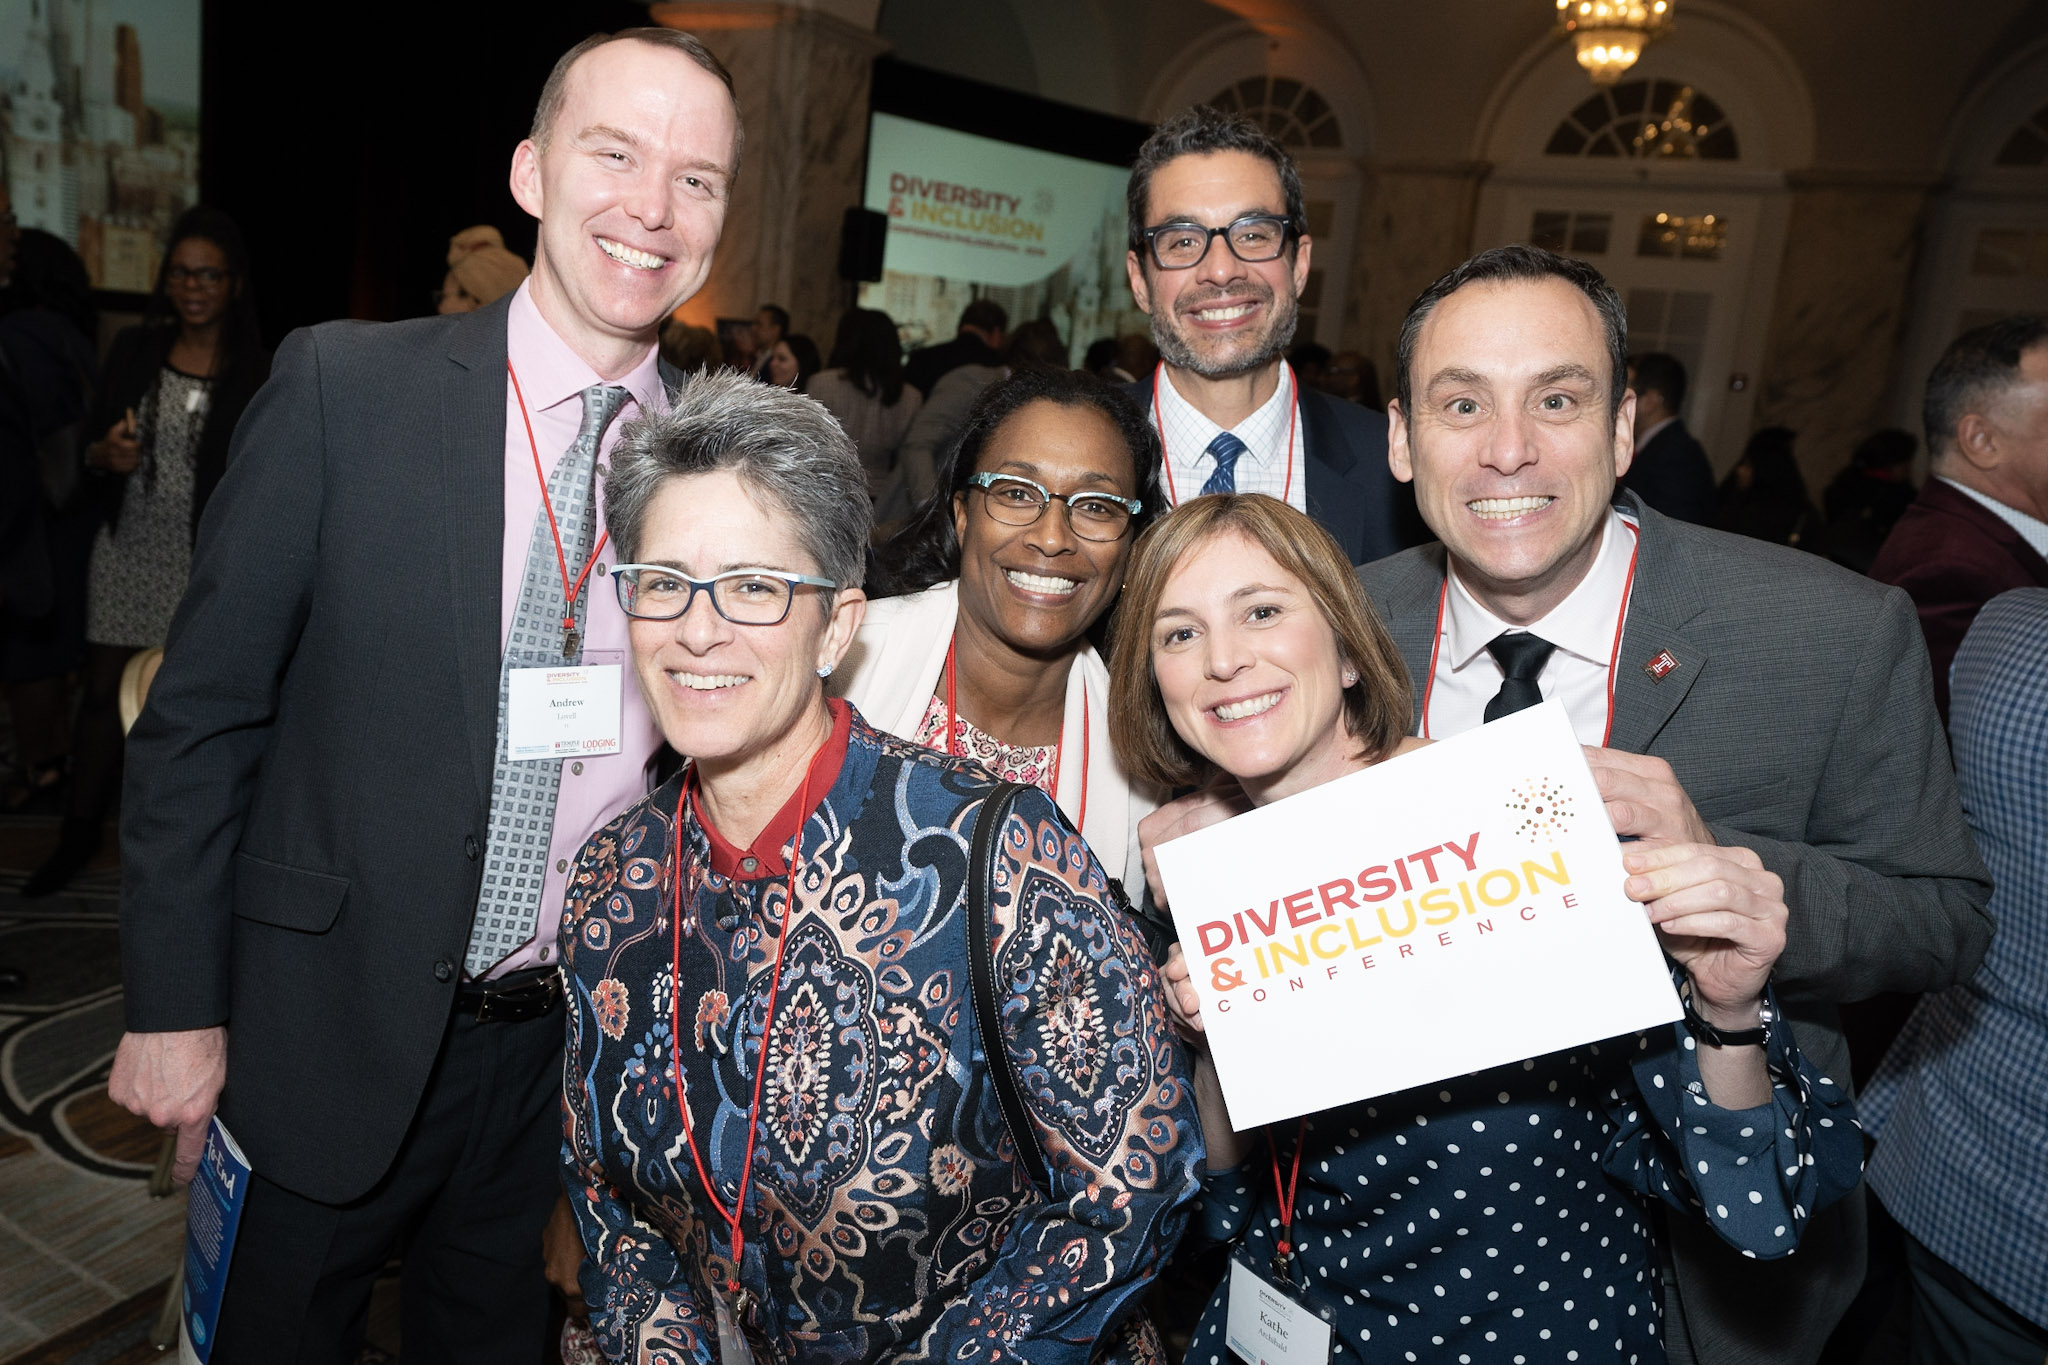 2019 Philadelphia Diversity & Inclusion Conference-107276-March 25, 2019101.jpg